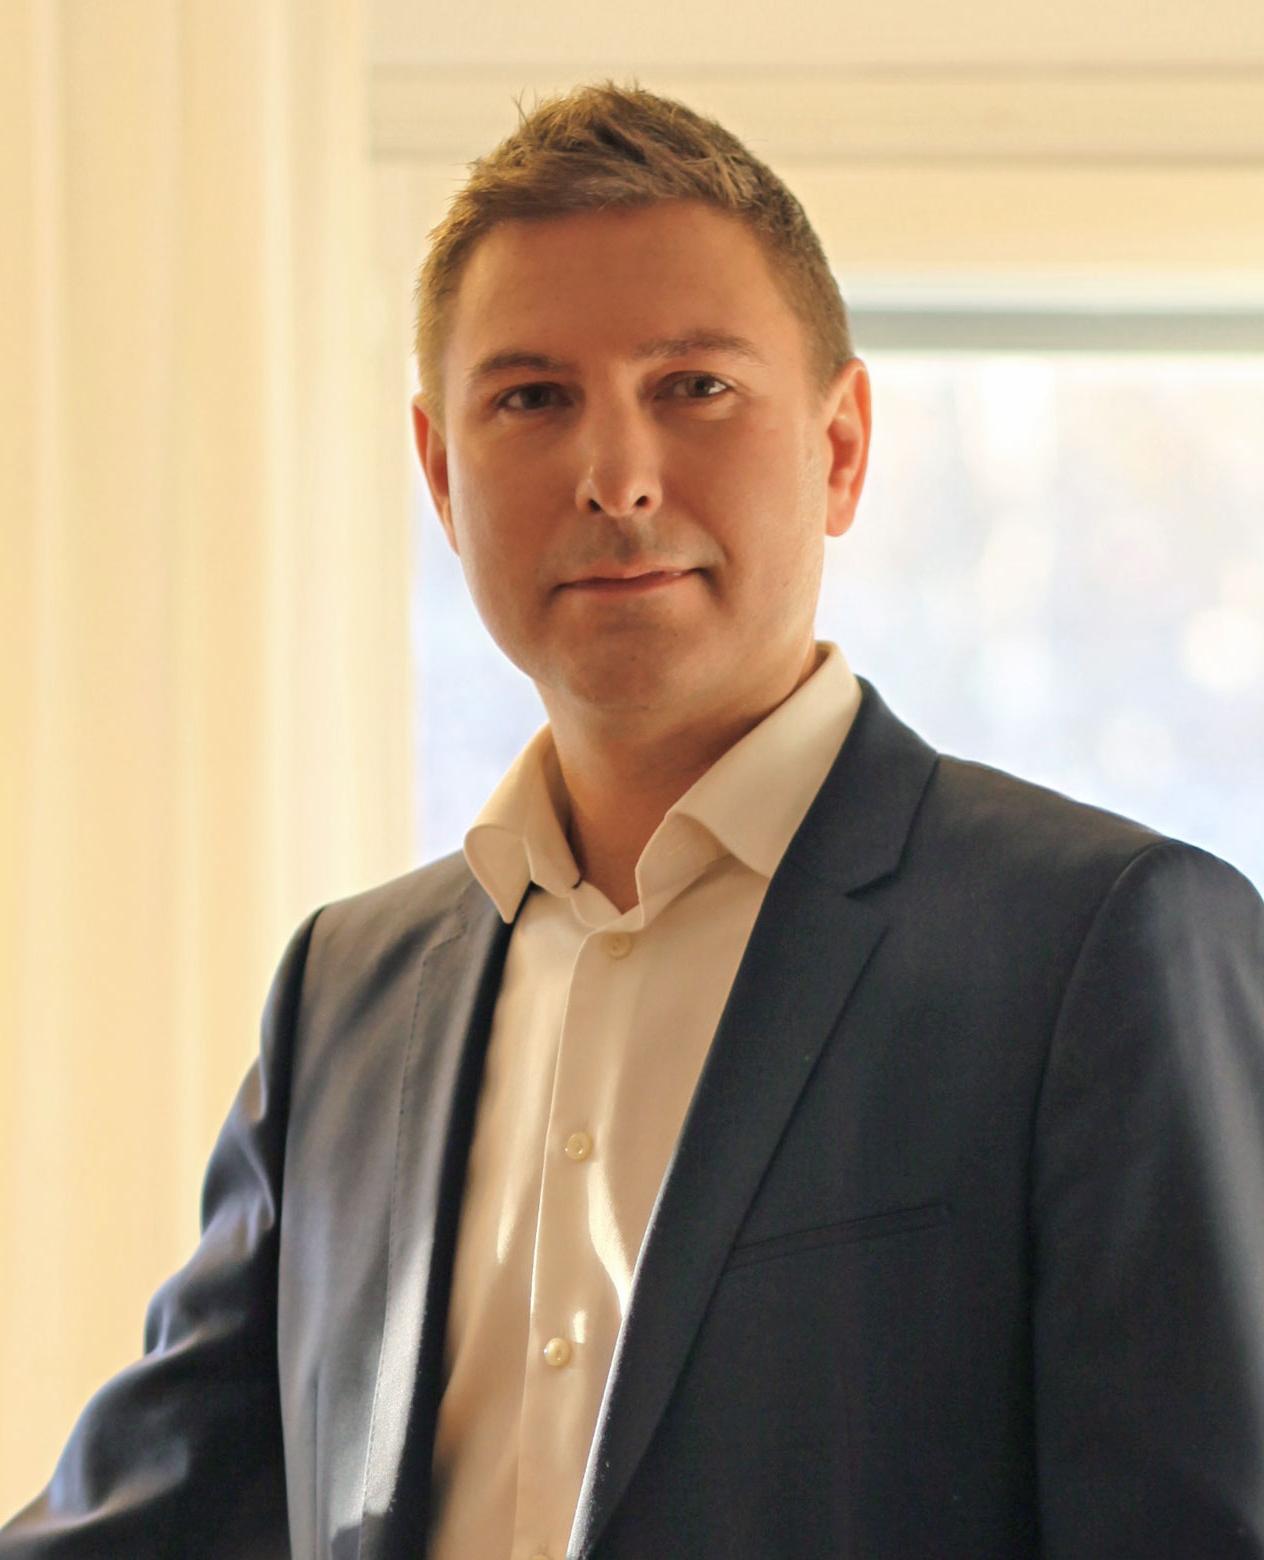 Fredrik Ahlström